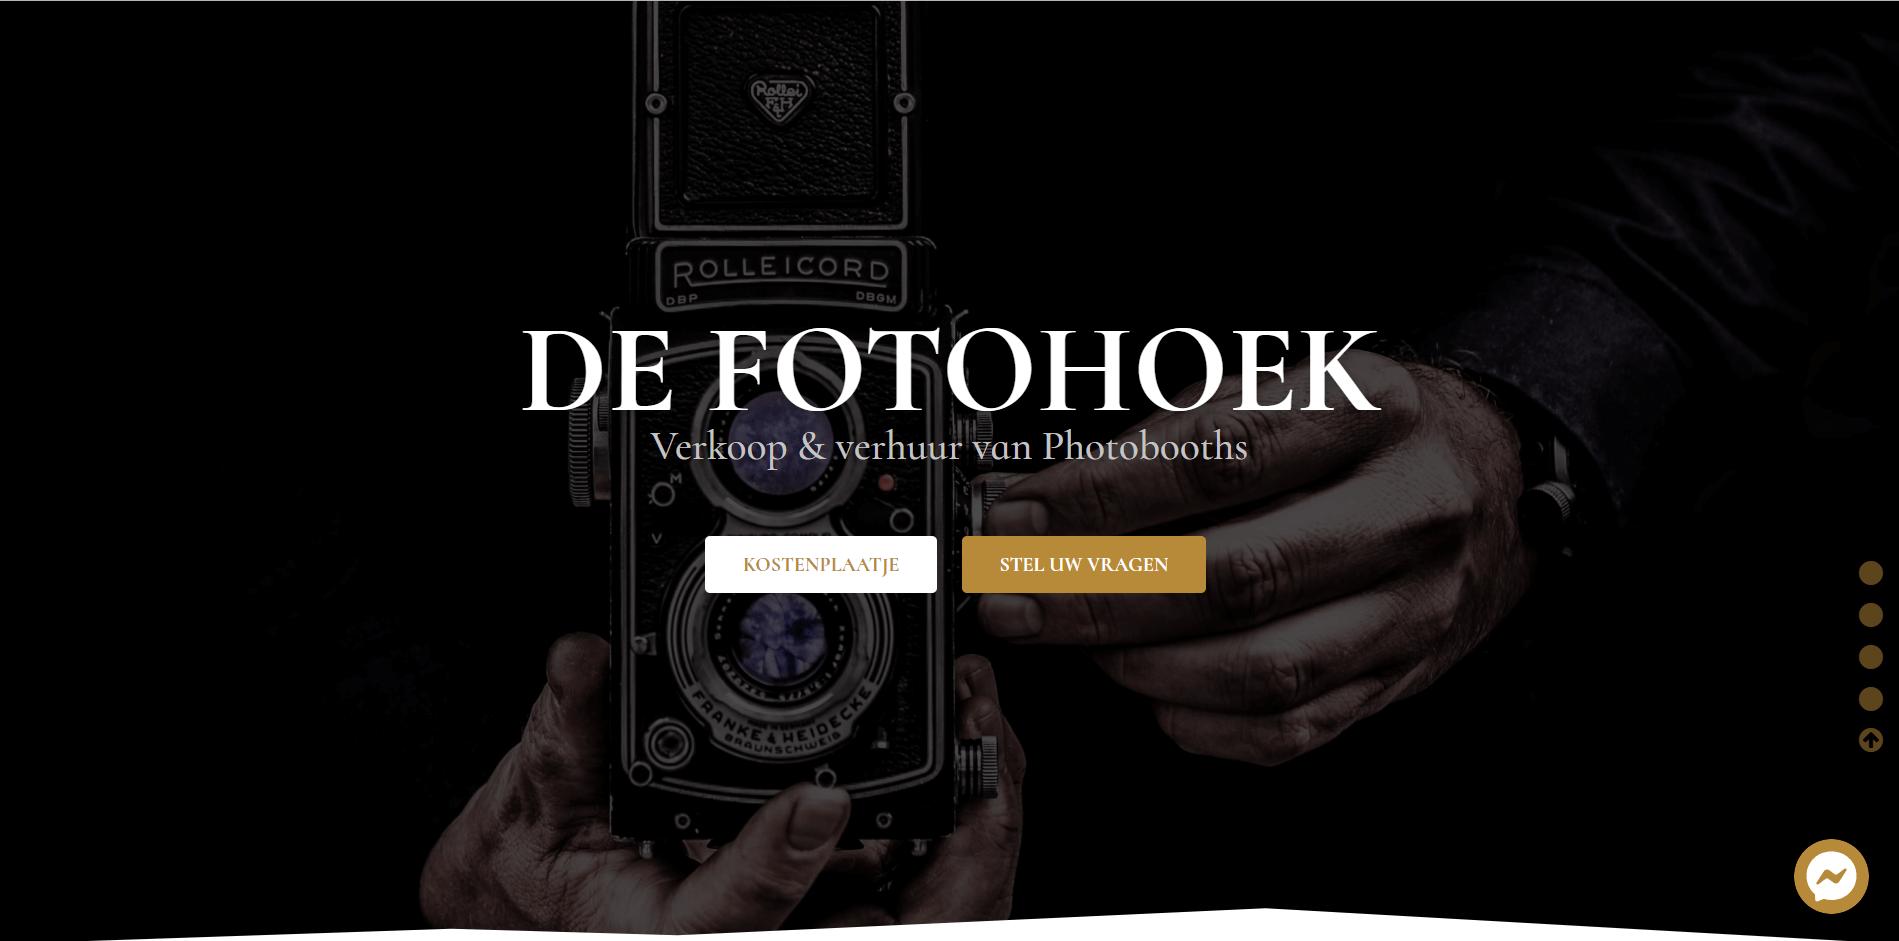 De Fotohoek